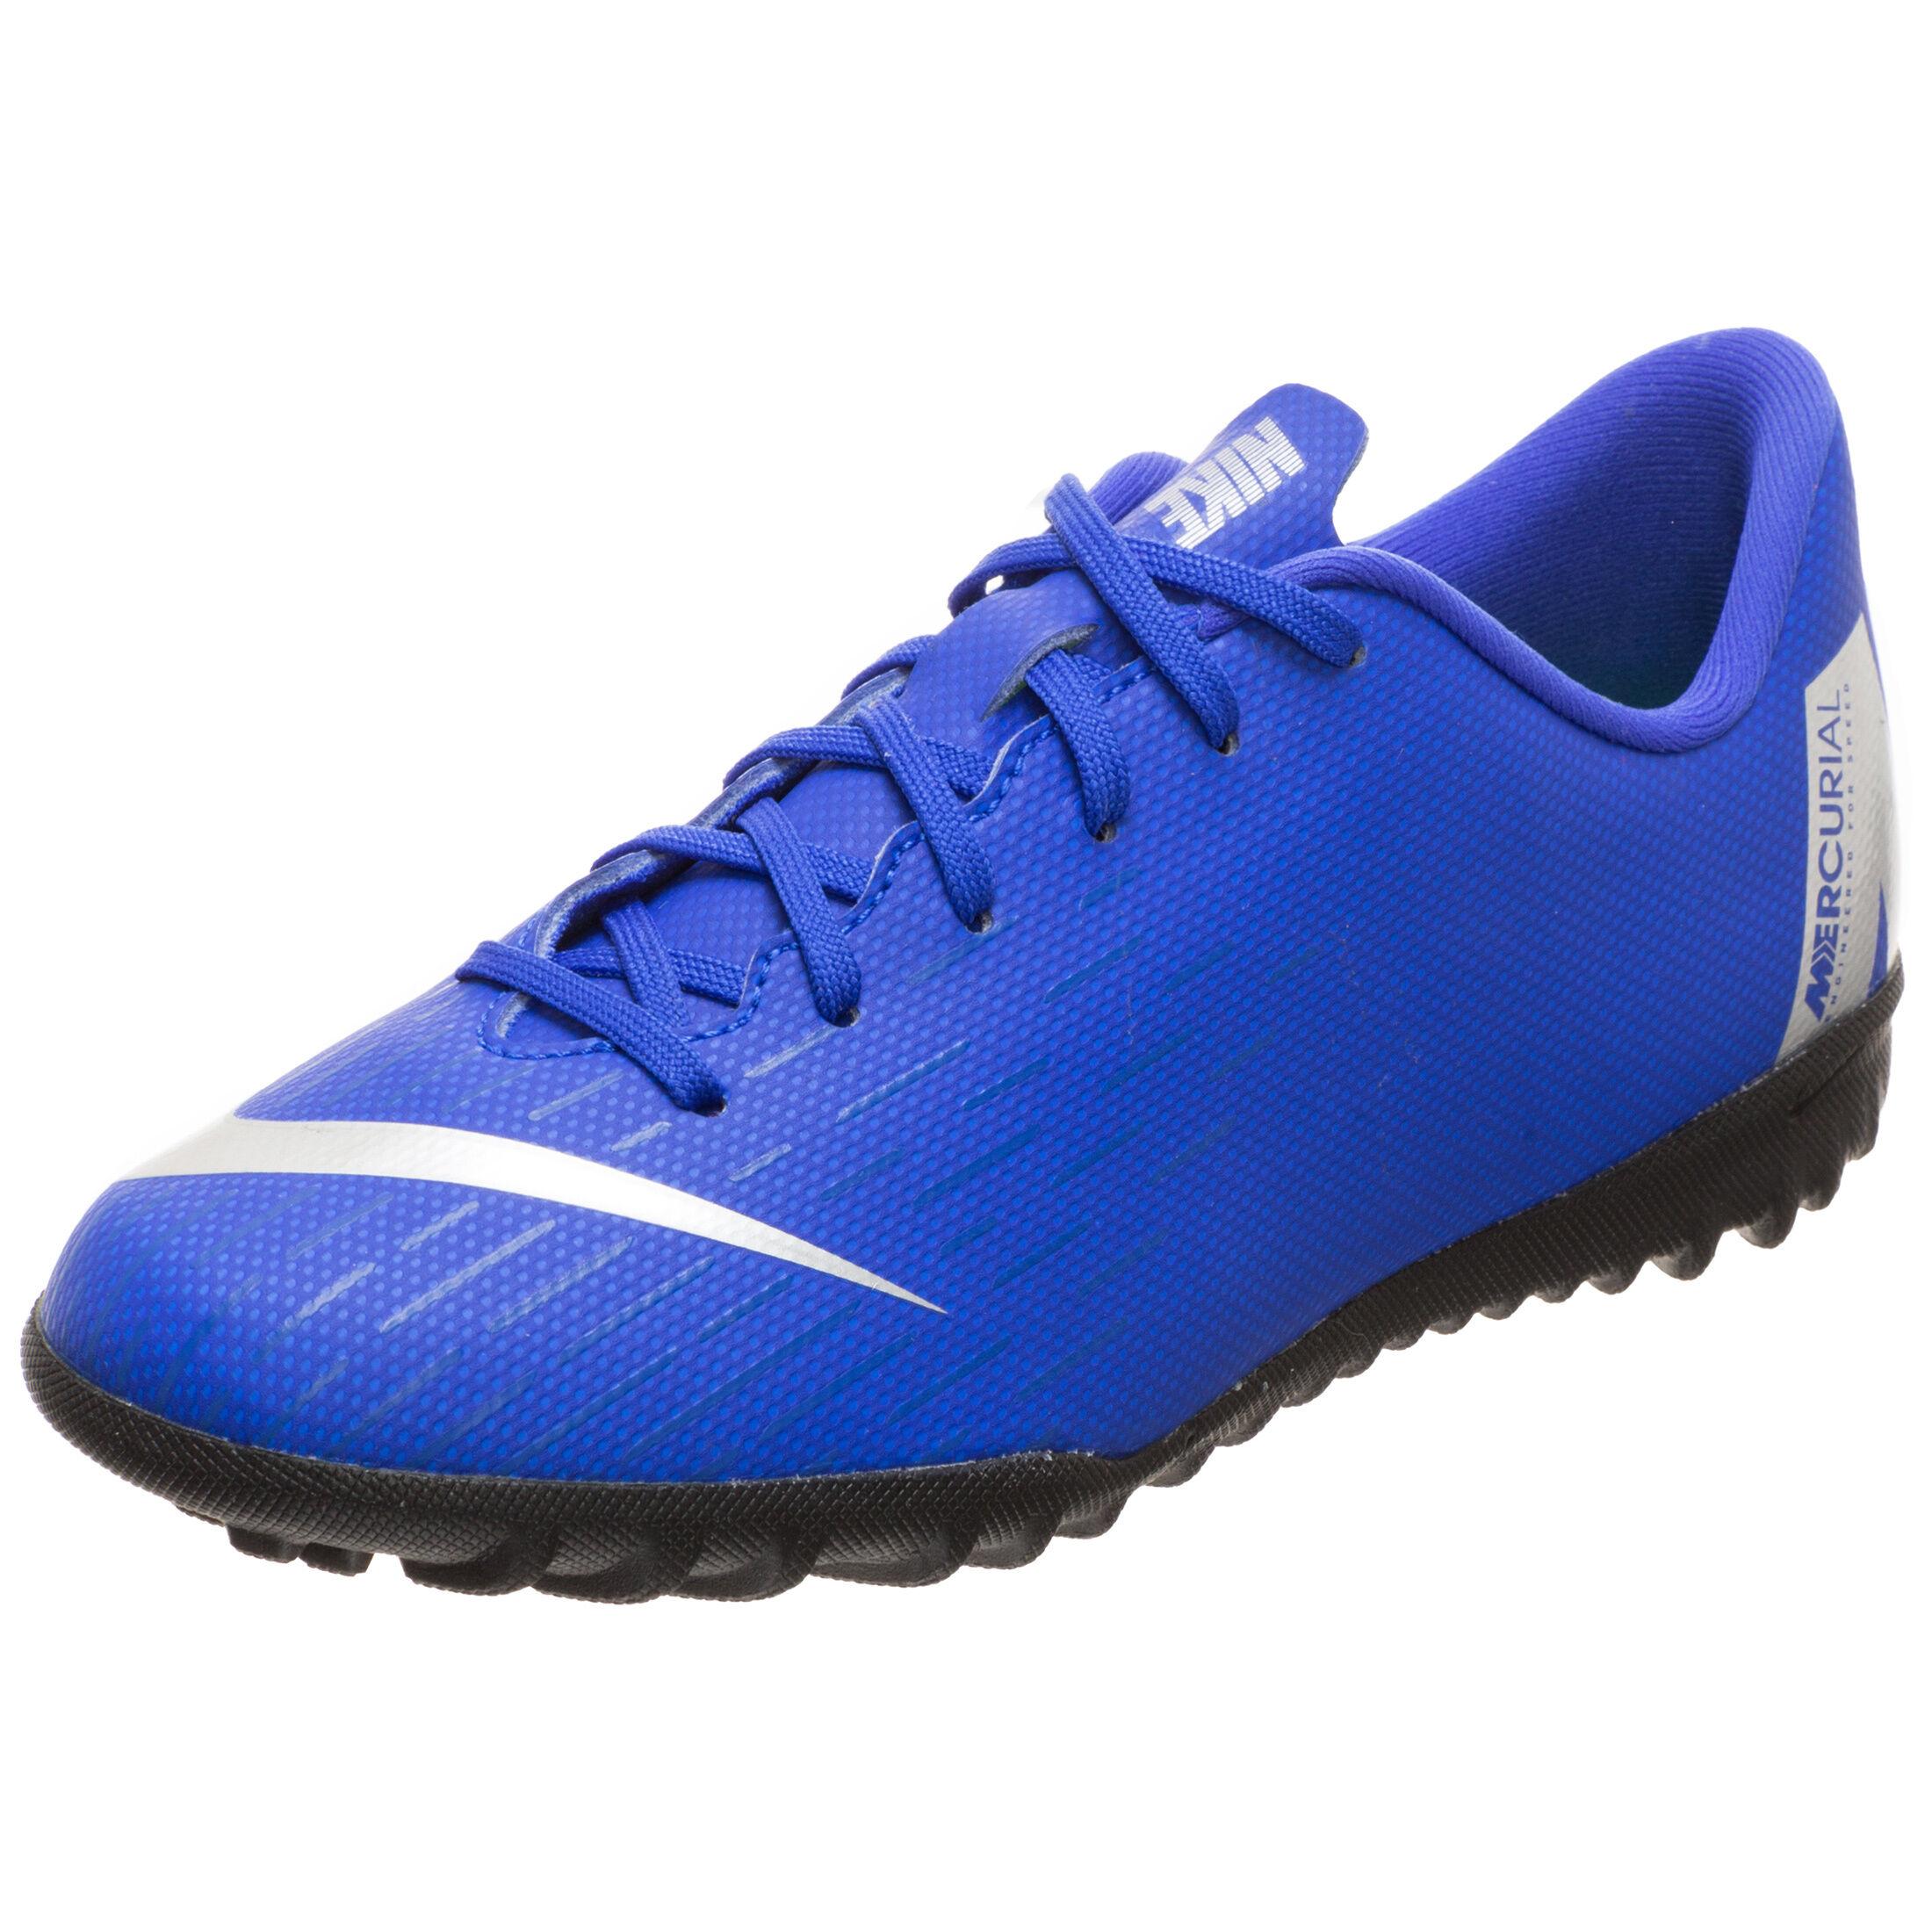 For Coupon Obs D02ee Vapor Nike Blau Fg Silber 16533 Superfly Mercurial 1ZwaqdZ